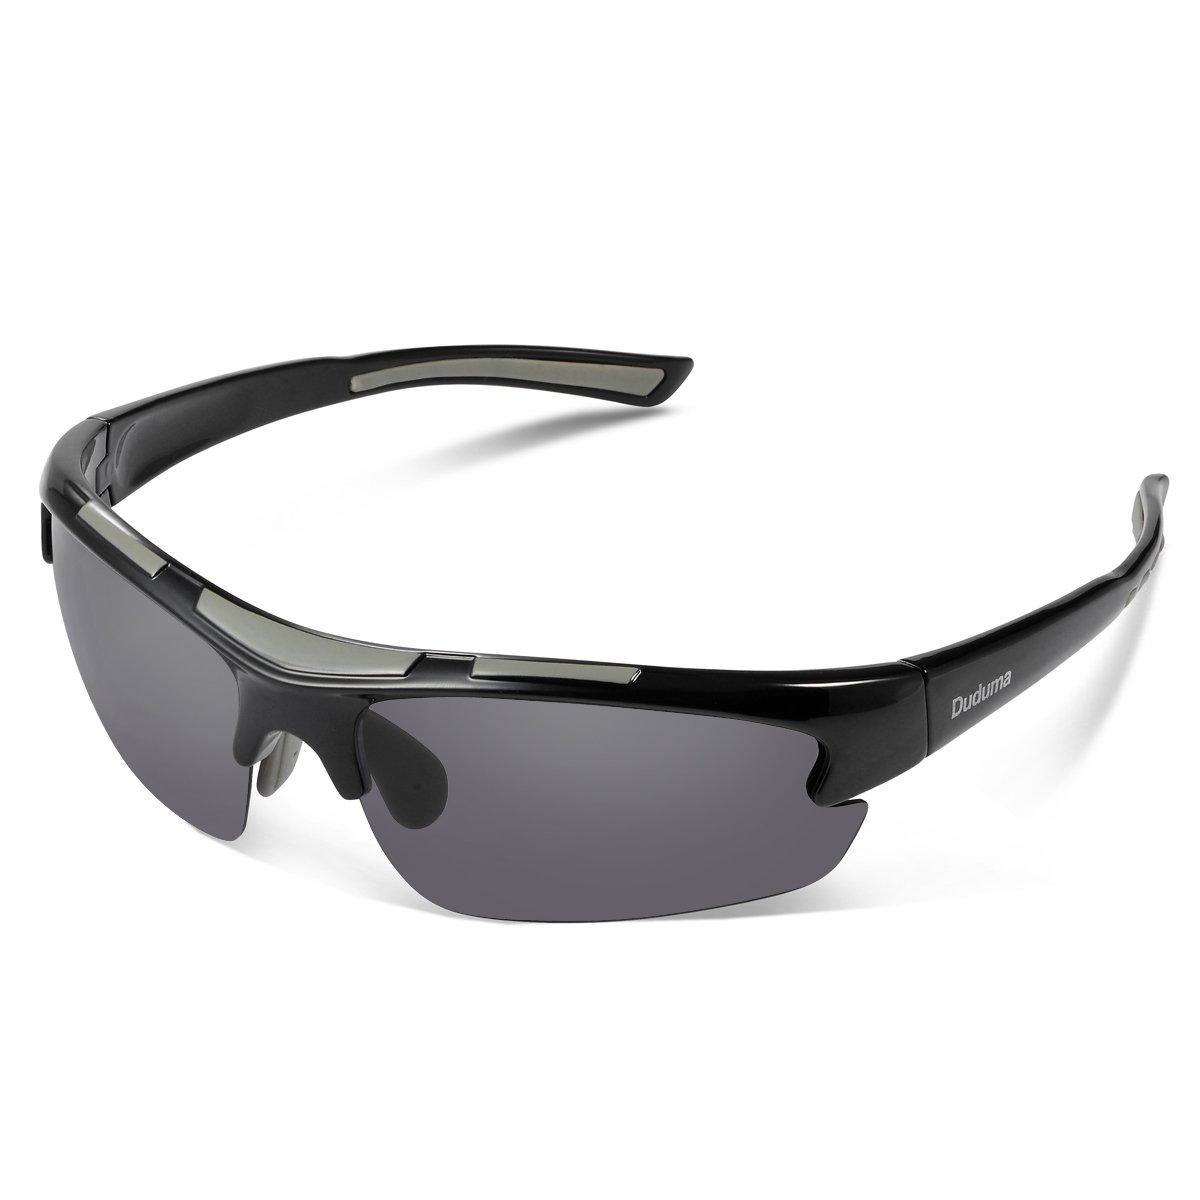 Duduma Polarized Designer Fashion Sports Sunglasses for Baseball Cycling Fishing Golf Tr62 Superlight Frame by Duduma